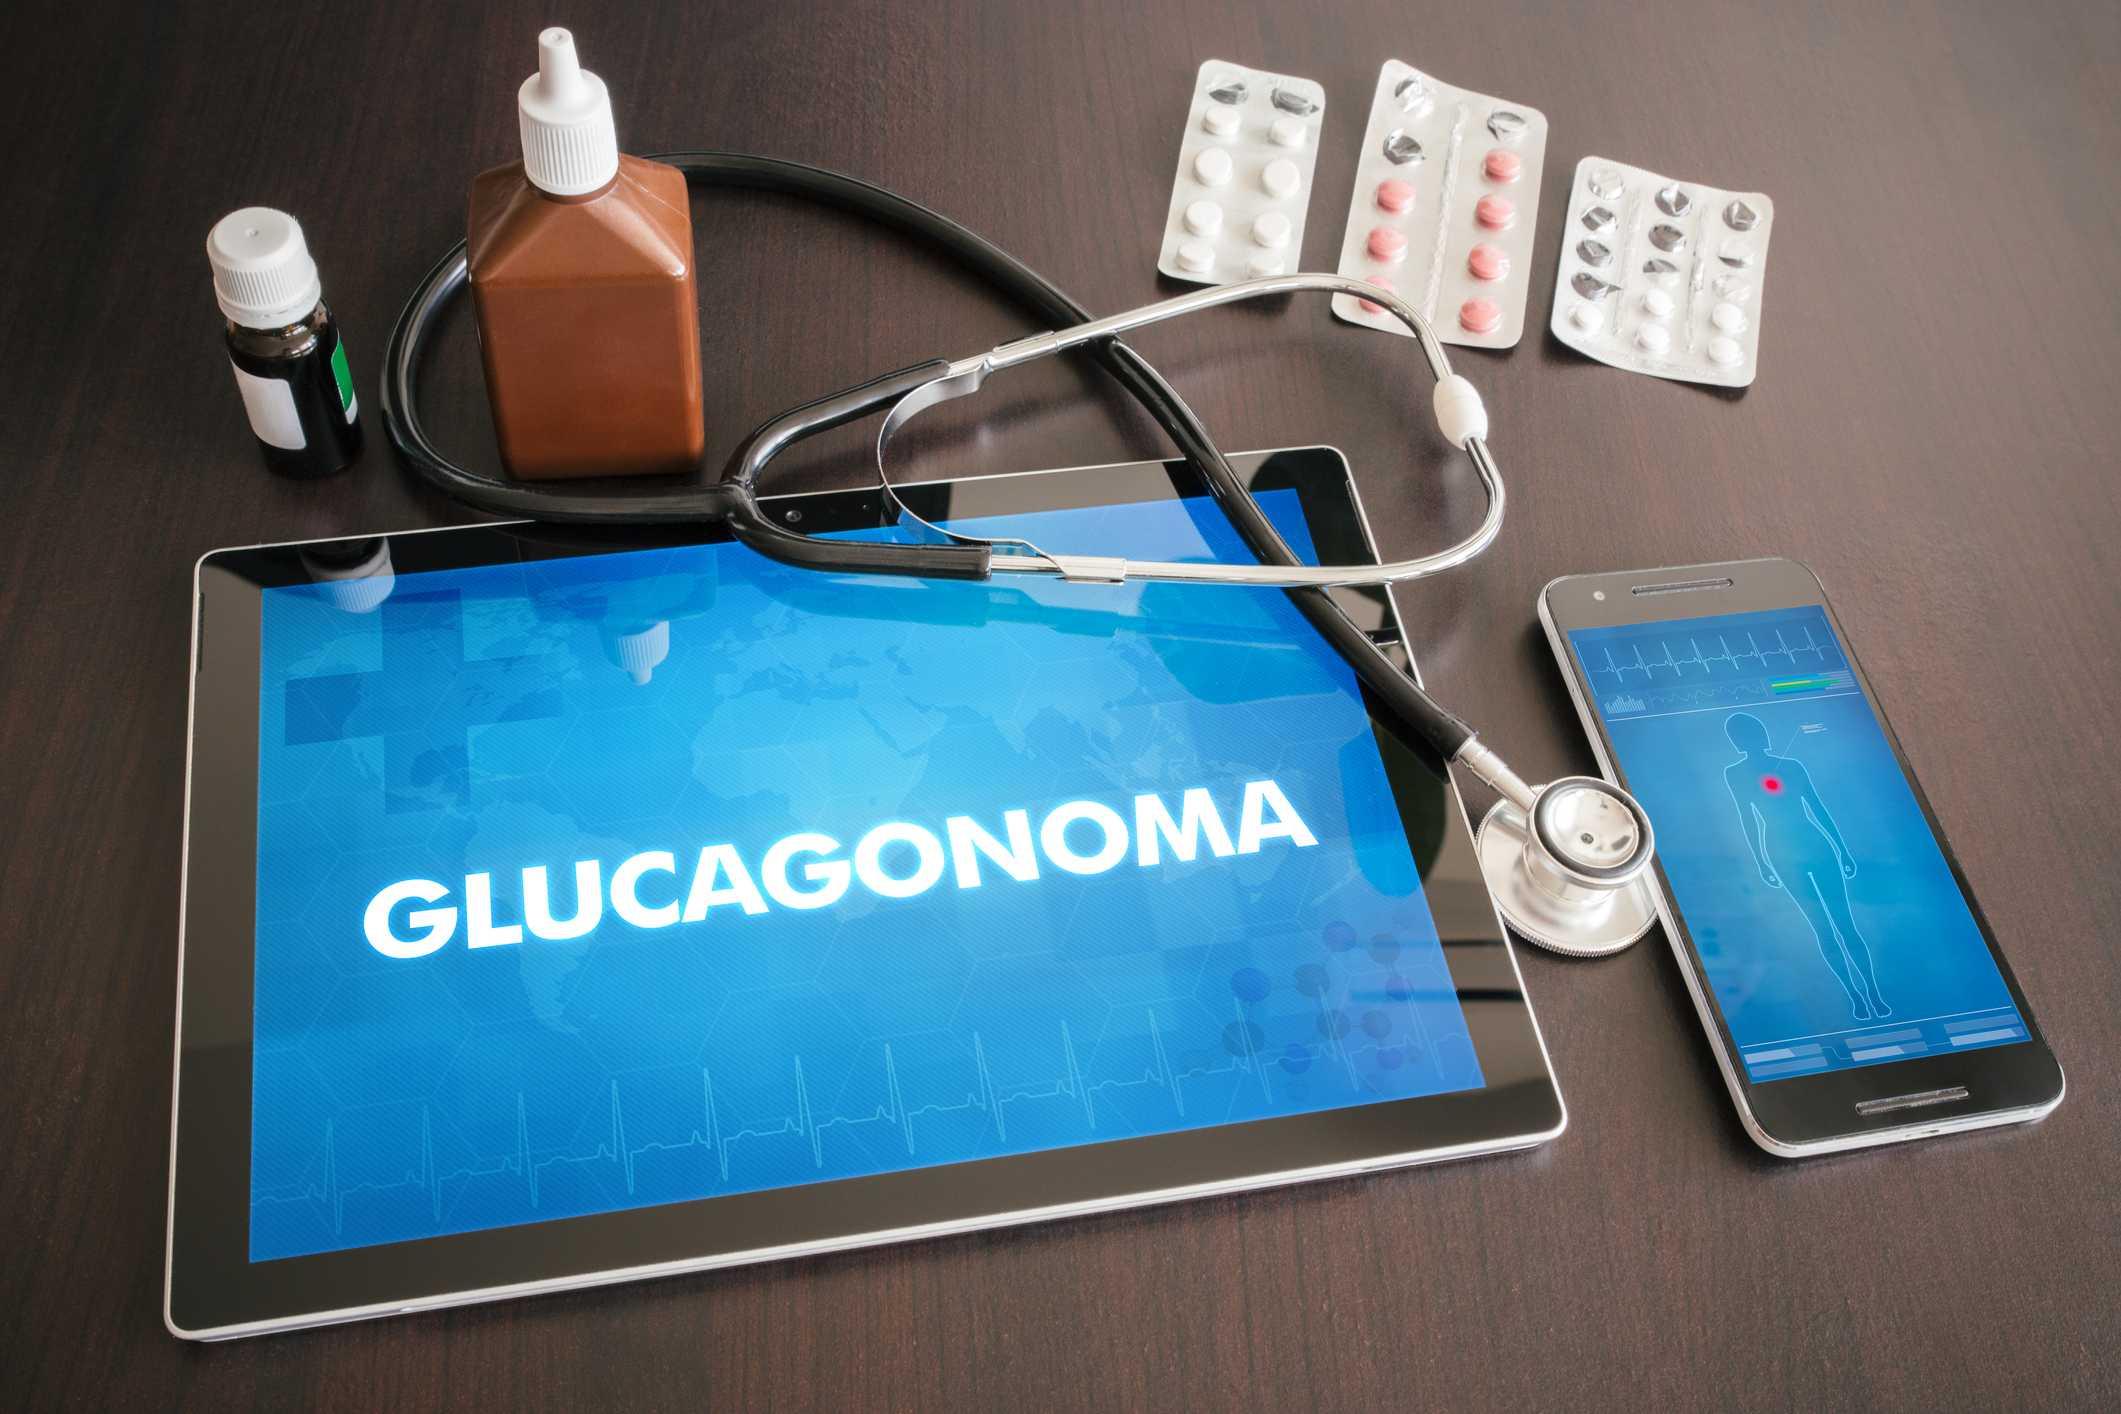 Glucagonoma